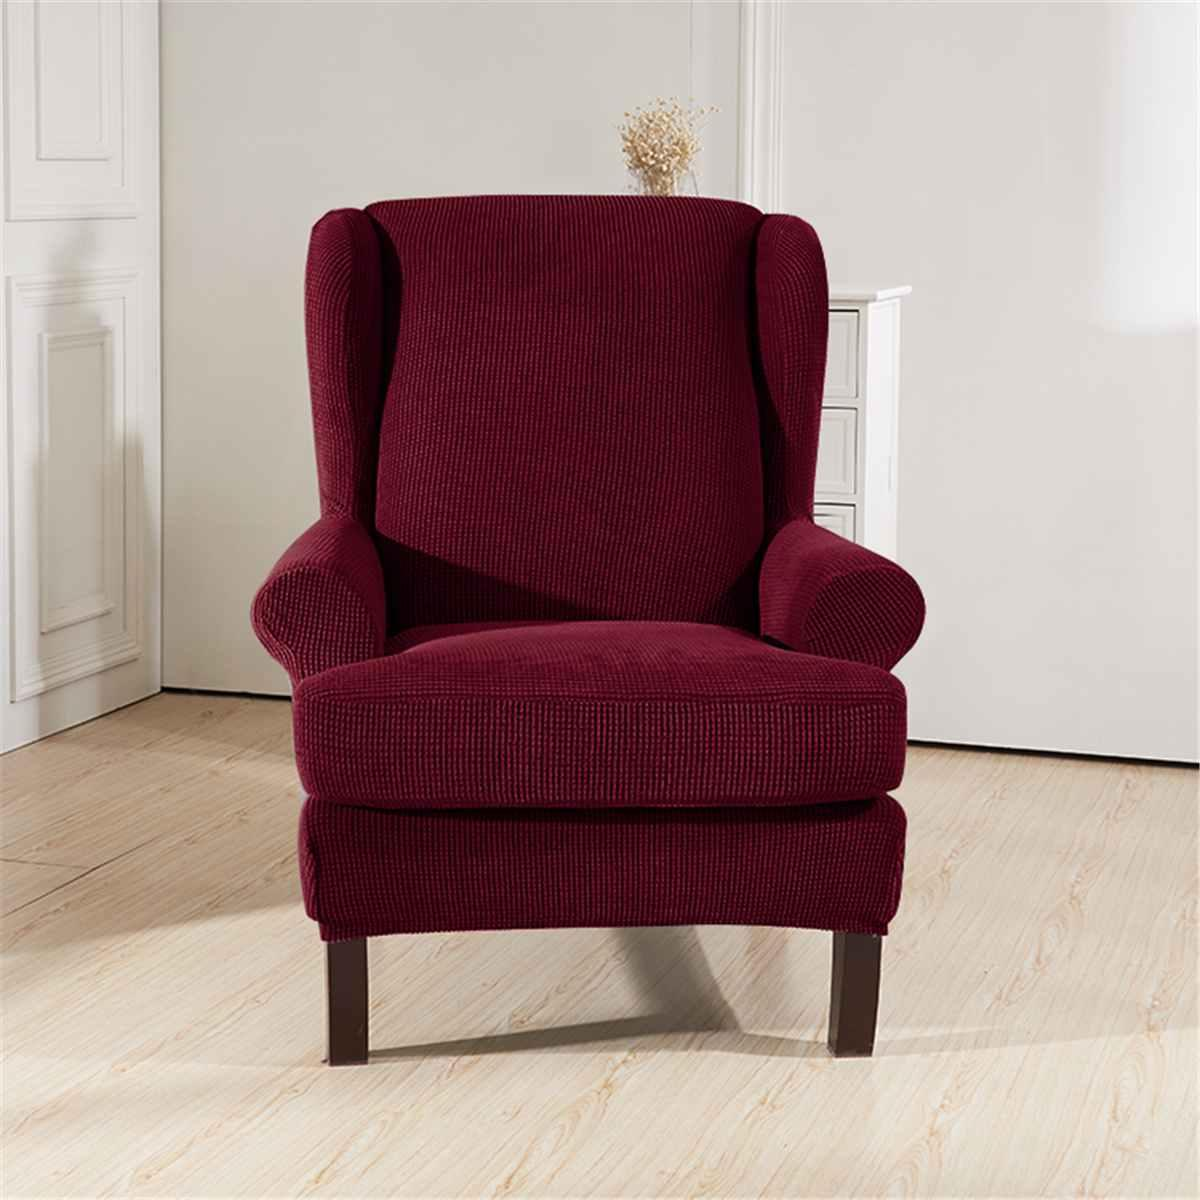 Inclinada Arm Rei Voltar Cadeira Coberta Elastic Poltrona Wingback poltrona Voltar Cadeira Coberta estiramento Protector slipcover Protector